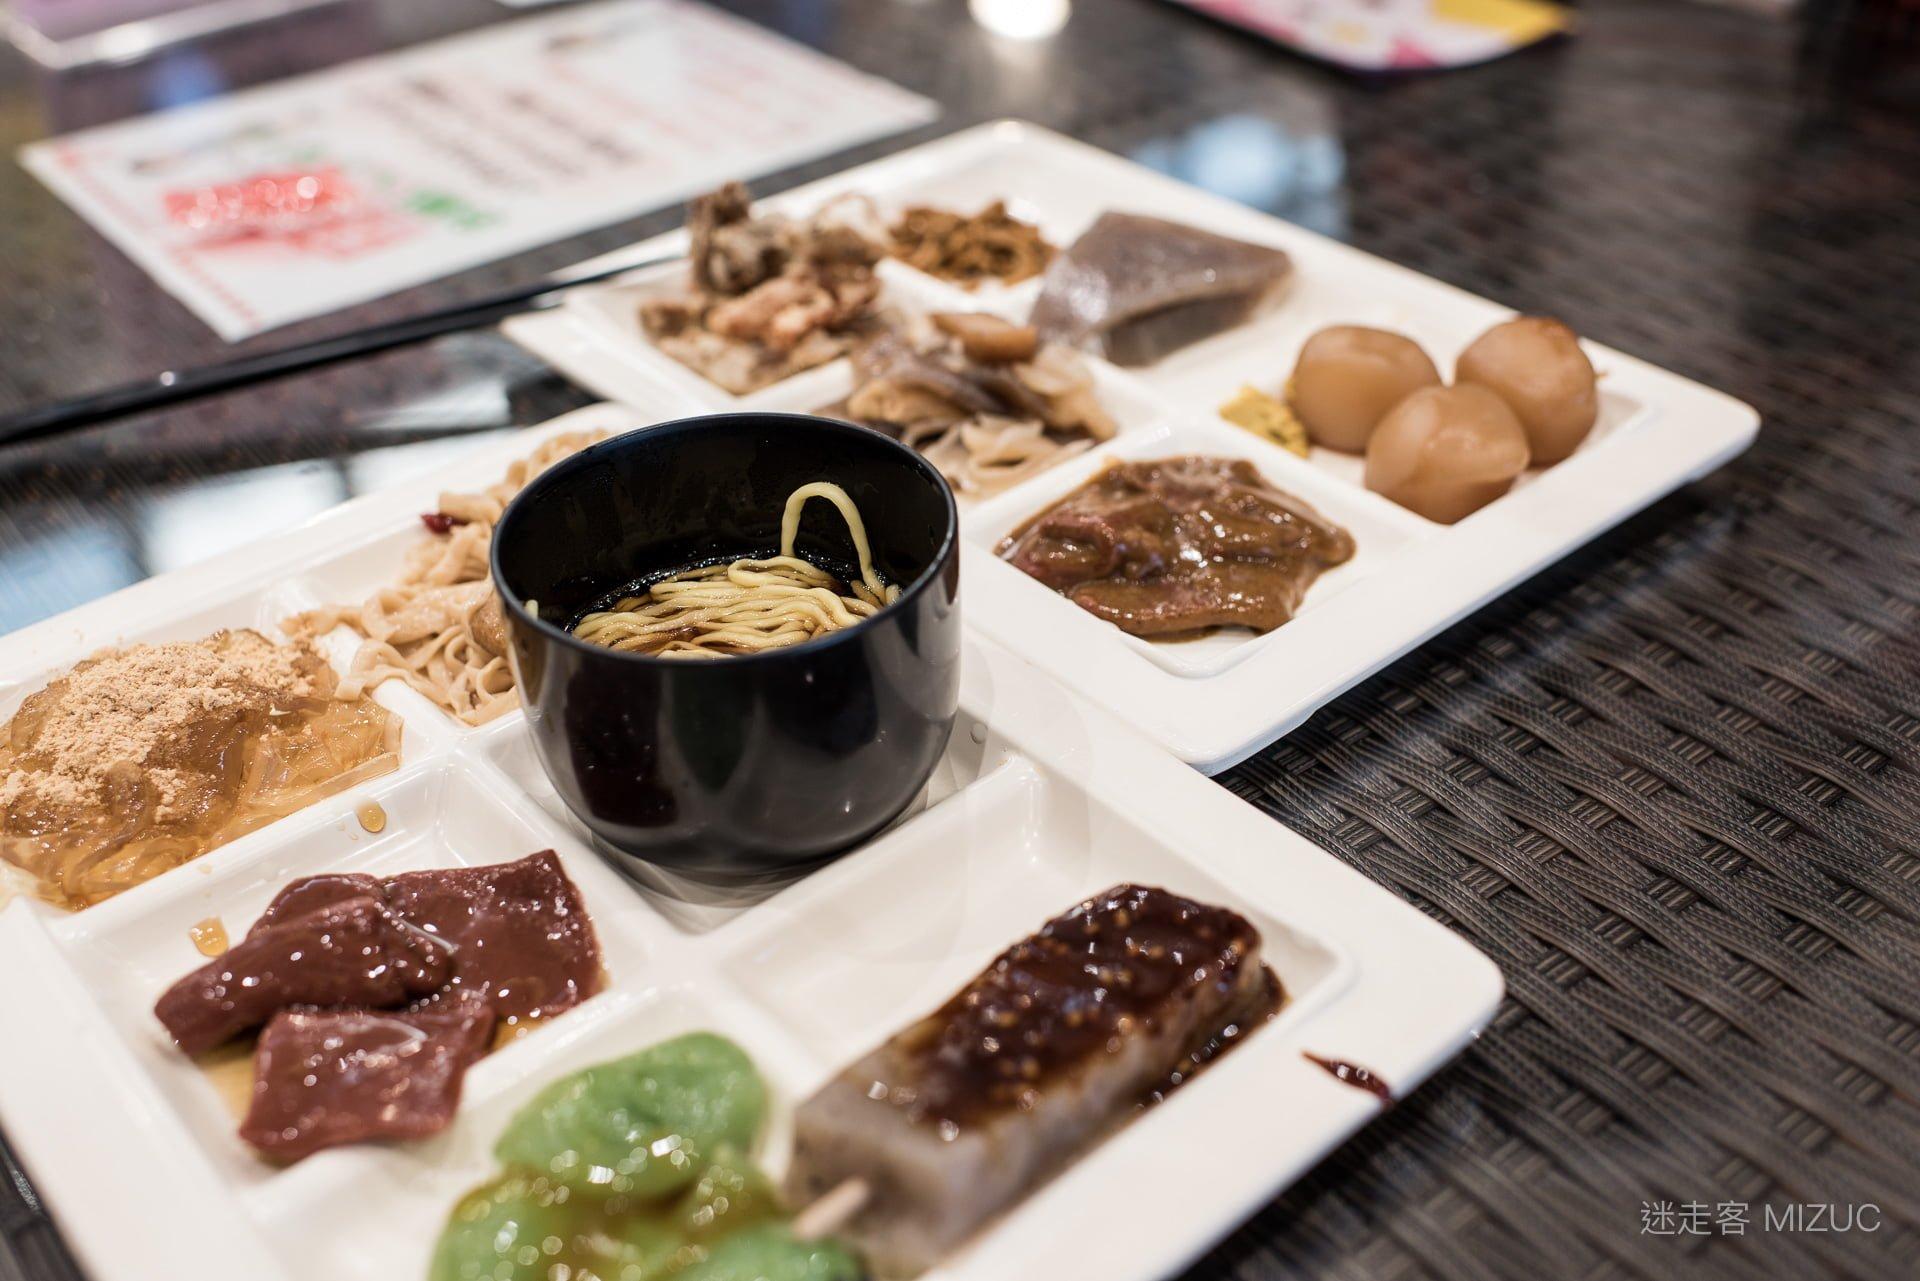 201711 Ibaraki Tochigi Gunma Japan Travel By RentalCar 92 日本自駕旅遊/北關東三縣「茨城、櫪木、群馬」秋天美食、溫泉與瀑布秘境百景(精選照片分享)